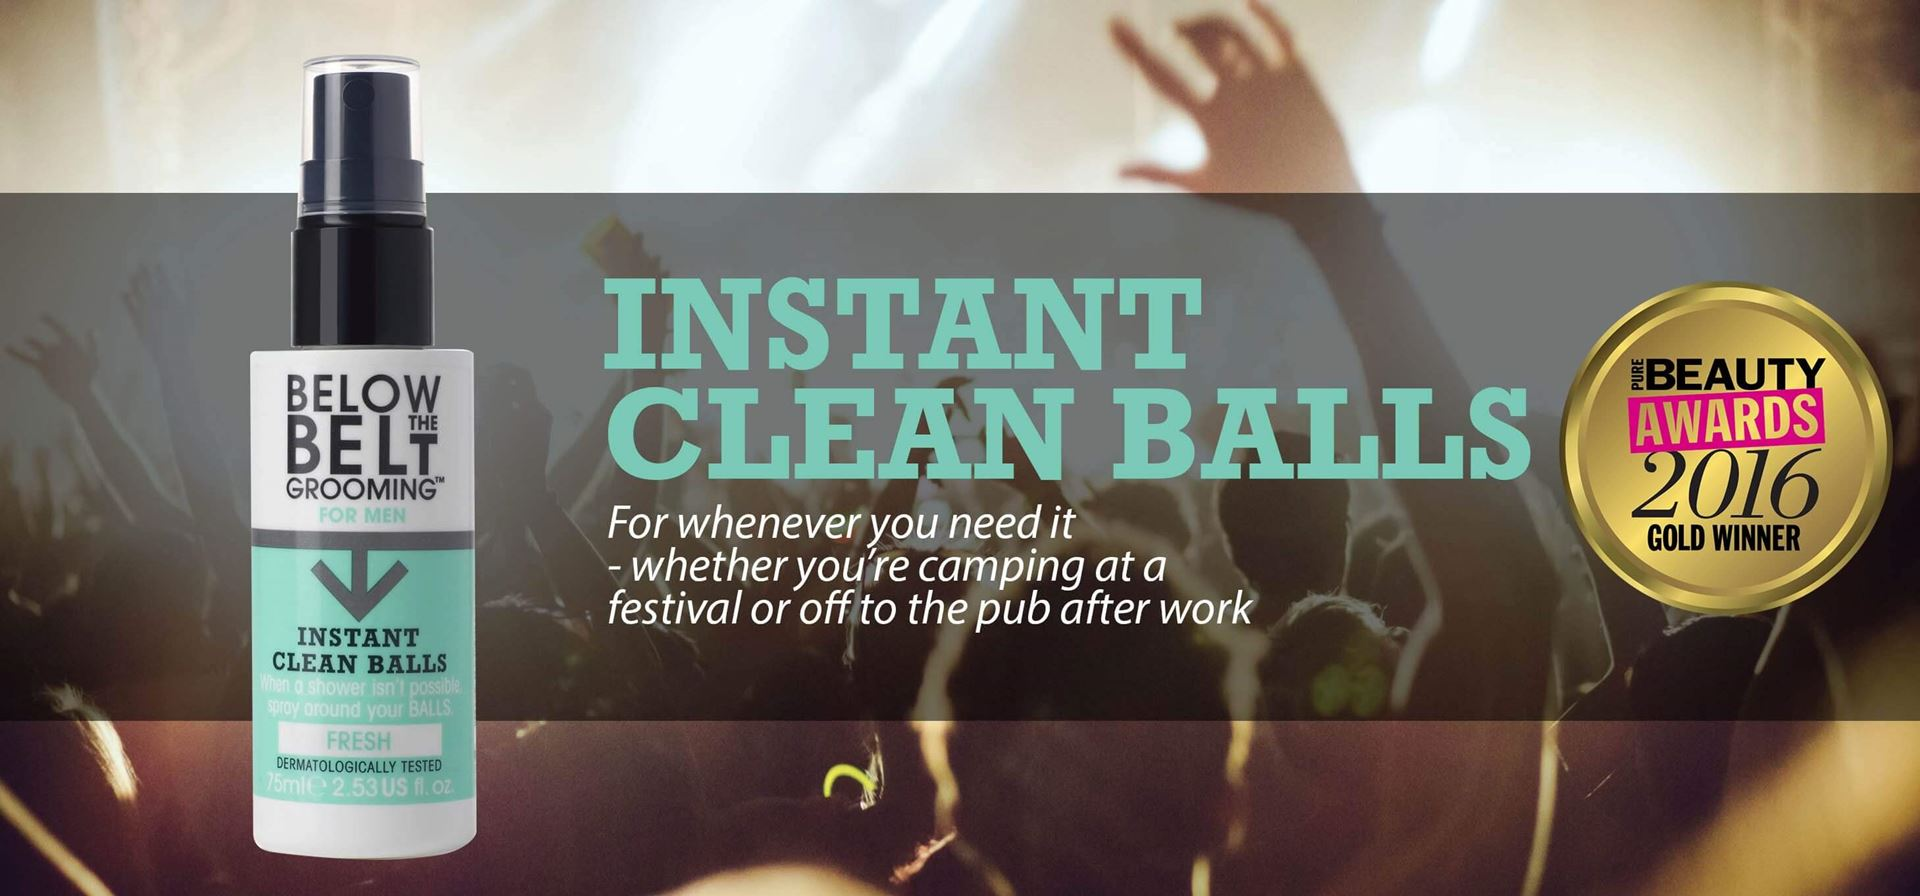 Instant Clean Balls